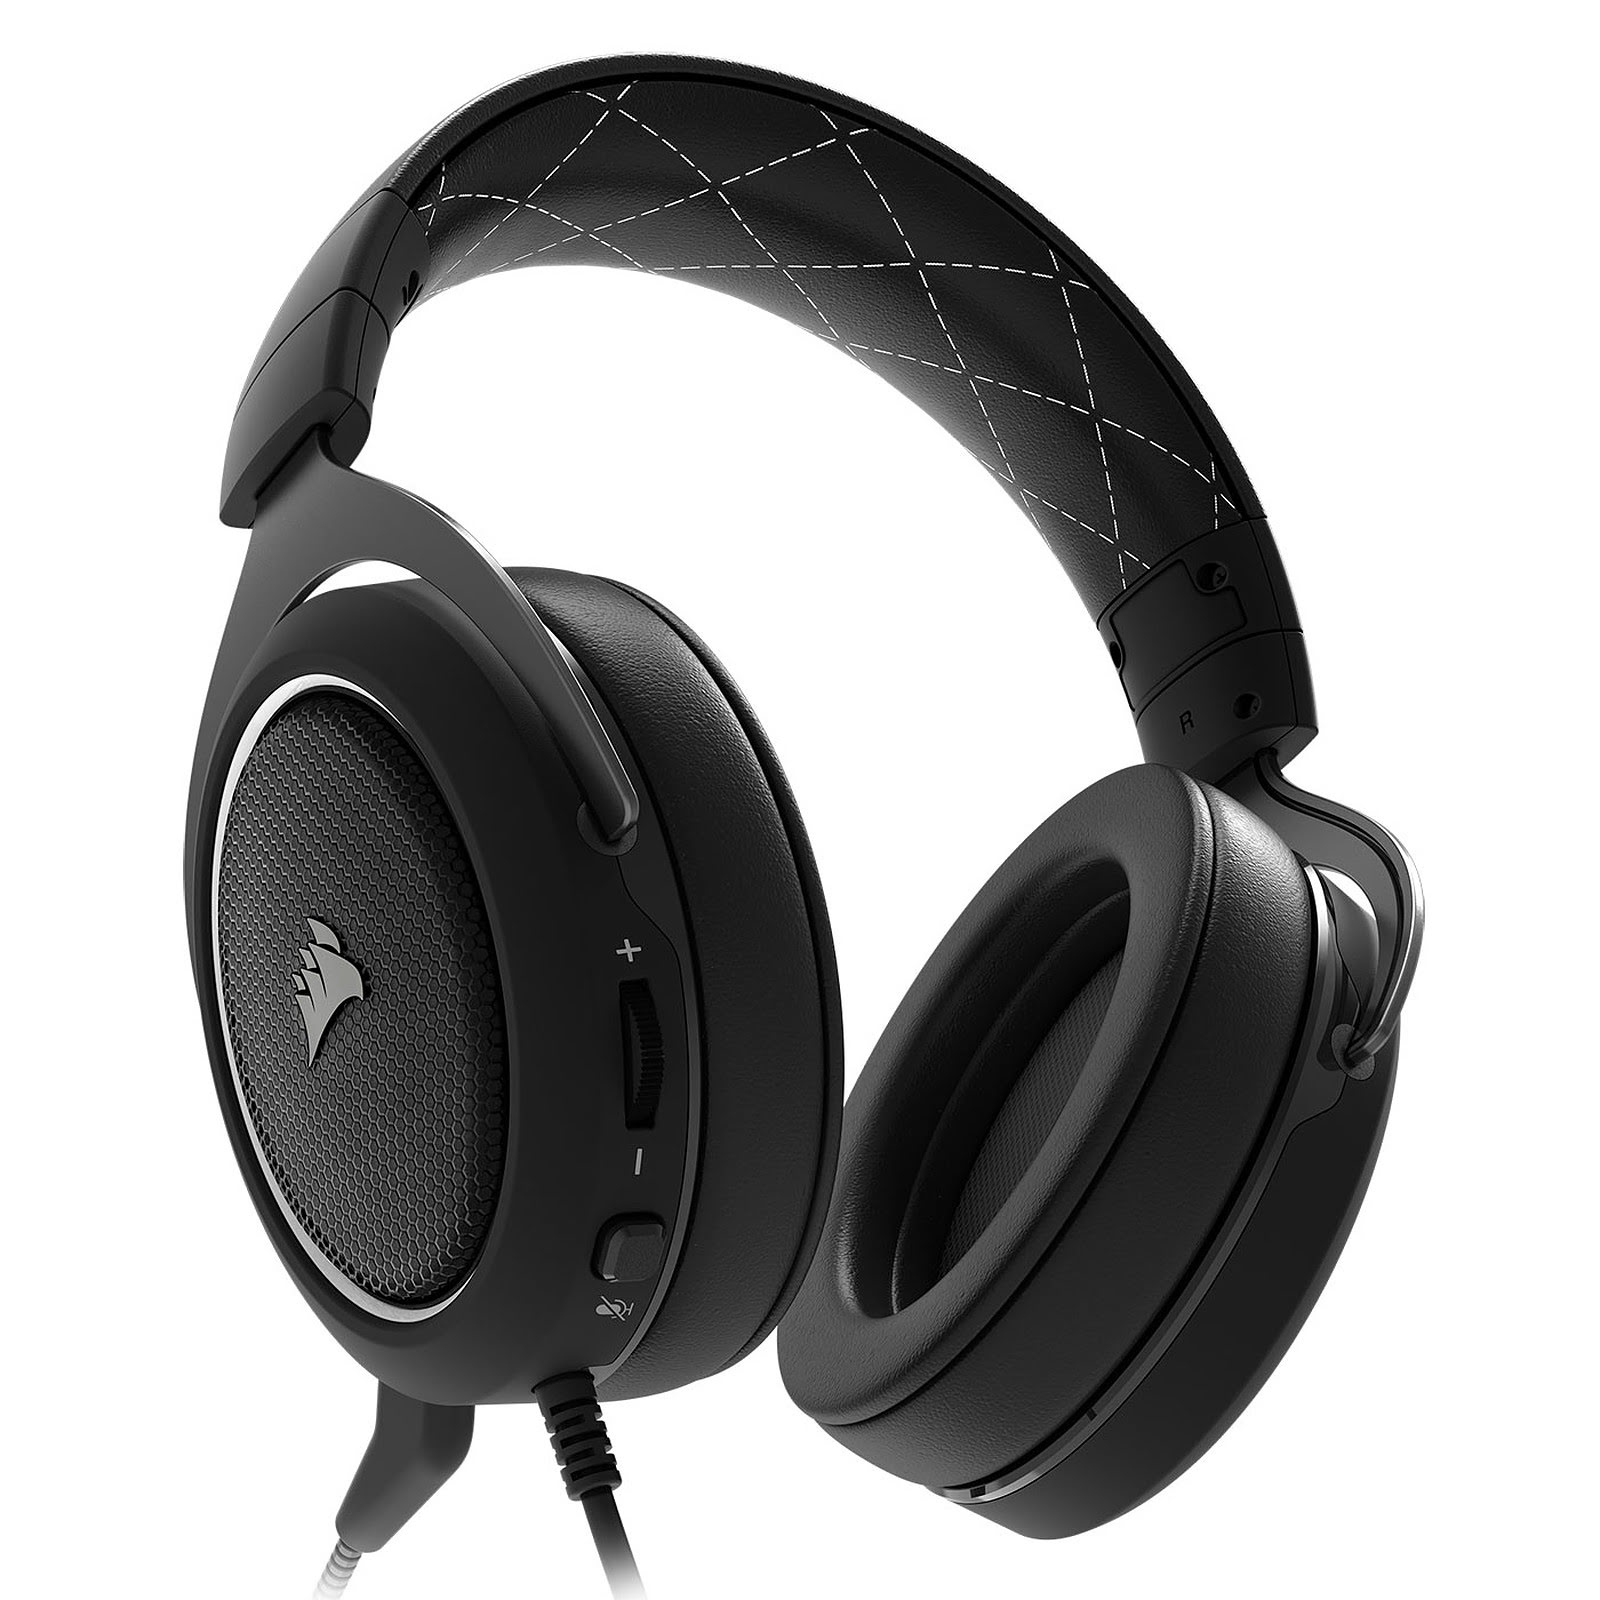 HS60 Surround White (CA-9011174-EU) - Achat / Vente Micro-casque sur Picata.fr - 1